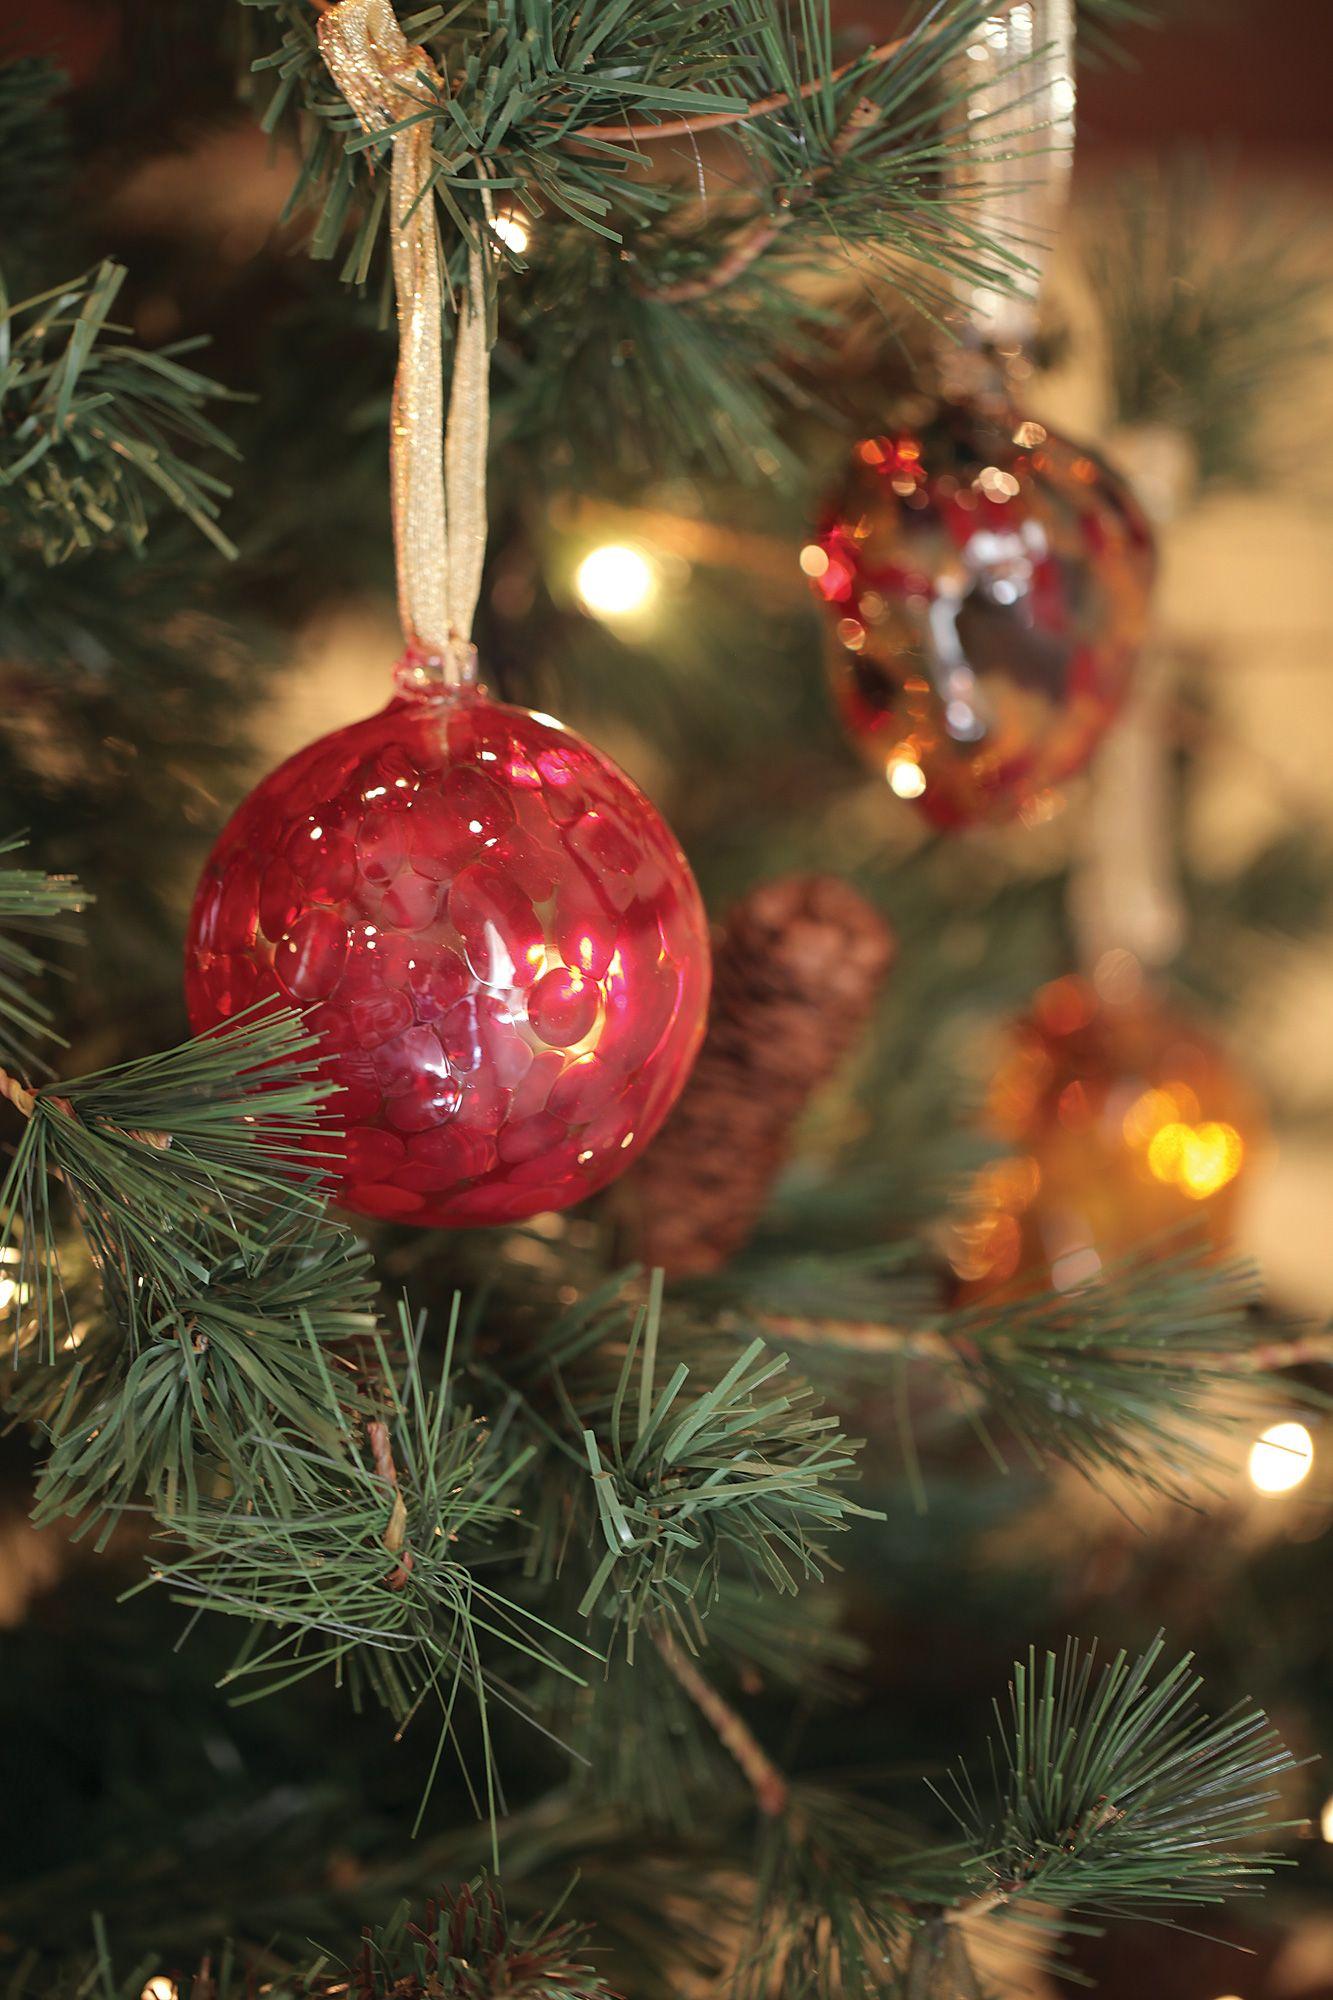 mdina glass christmas baubles httpwwwmdinaglasscommt